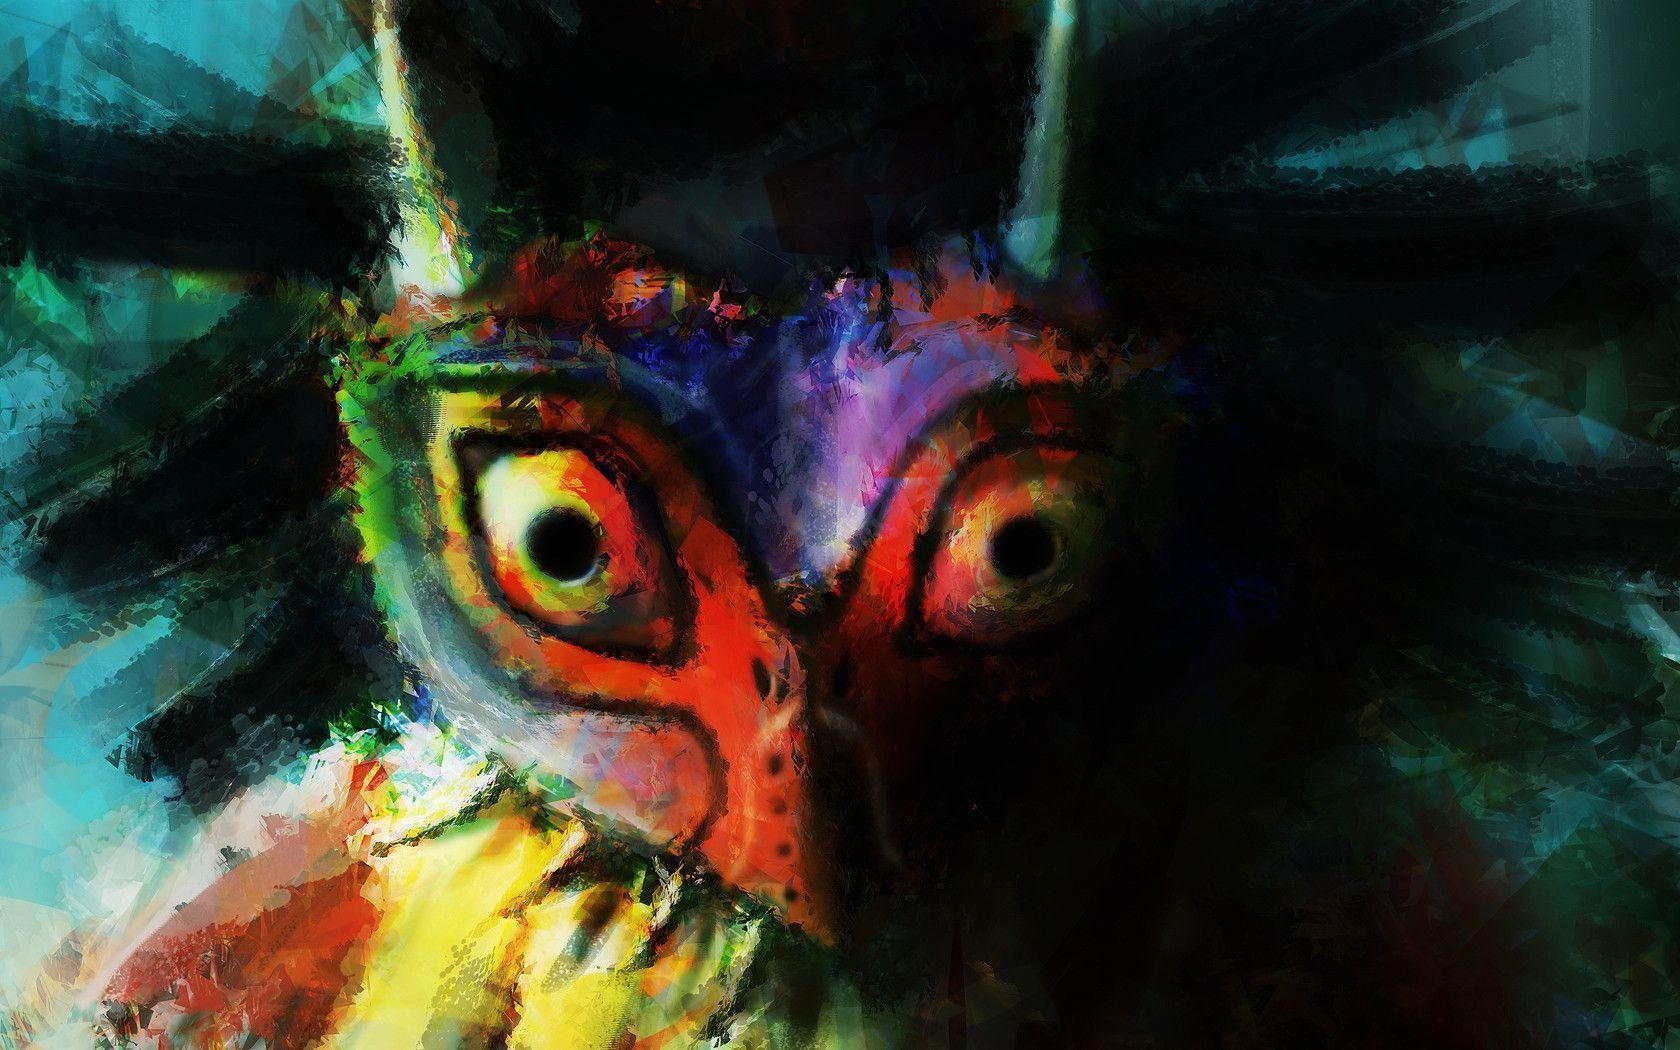 Majoras Mask Wallpapers - Wallpaper Cave